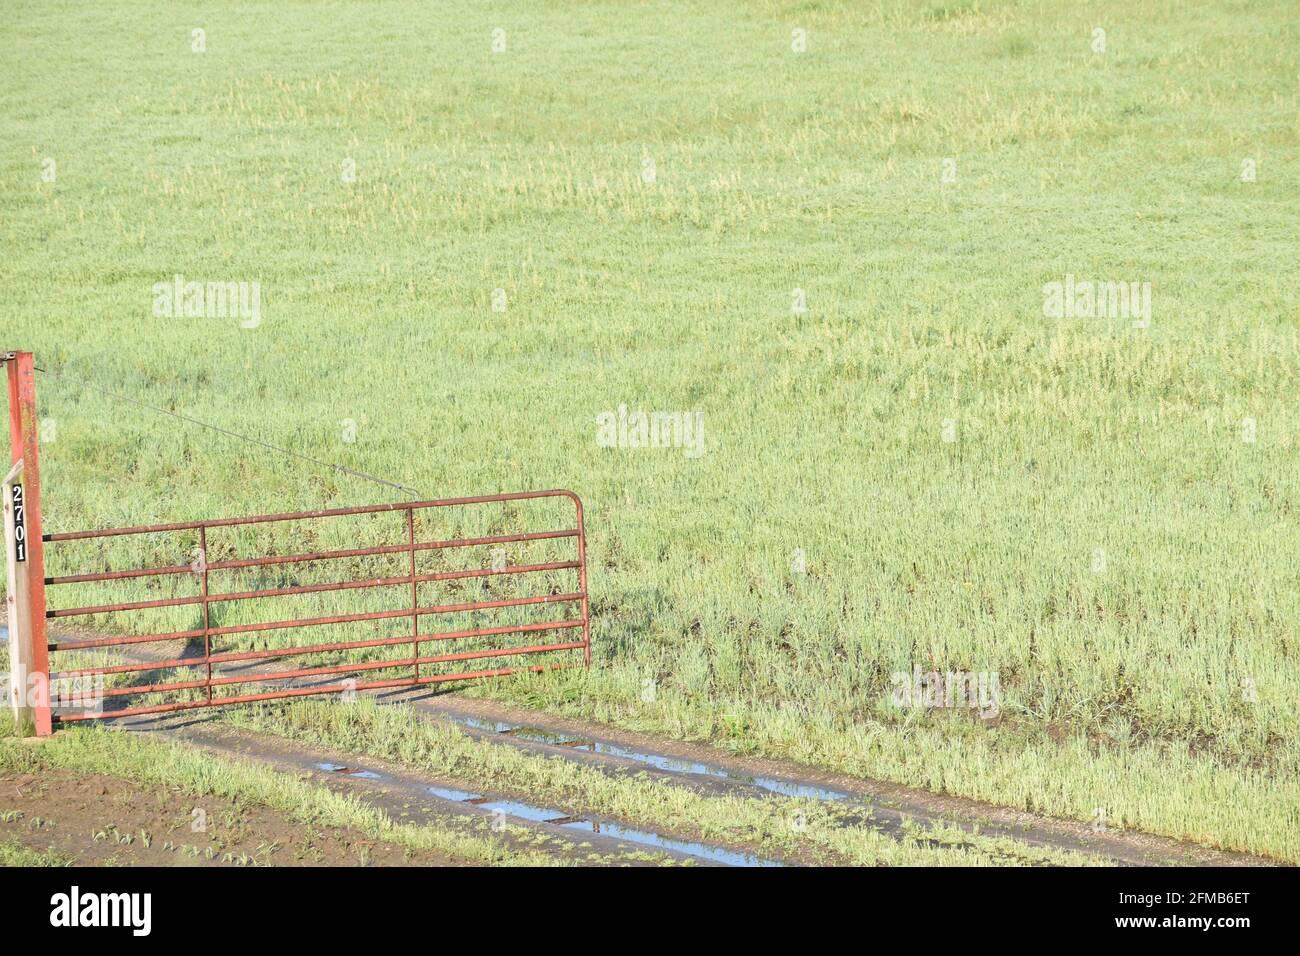 Red farm gate near a grassy field Stock Photo